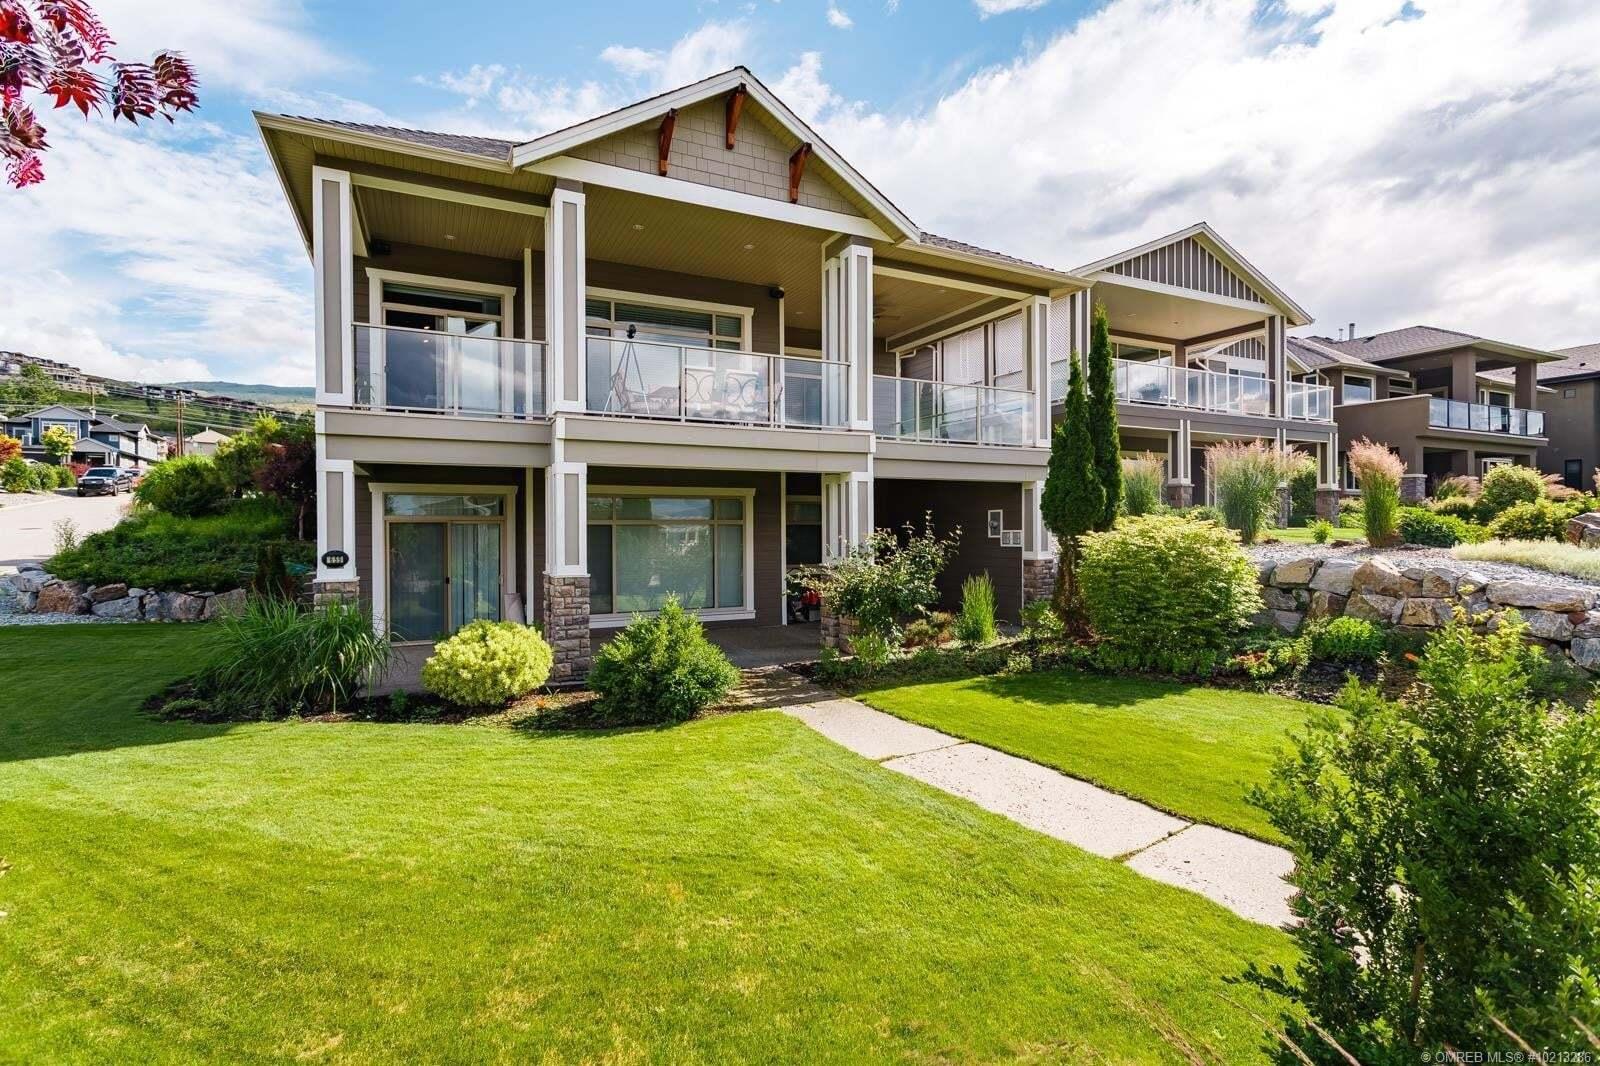 House for sale at 655 Devonian Ave Kelowna British Columbia - MLS: 10213286